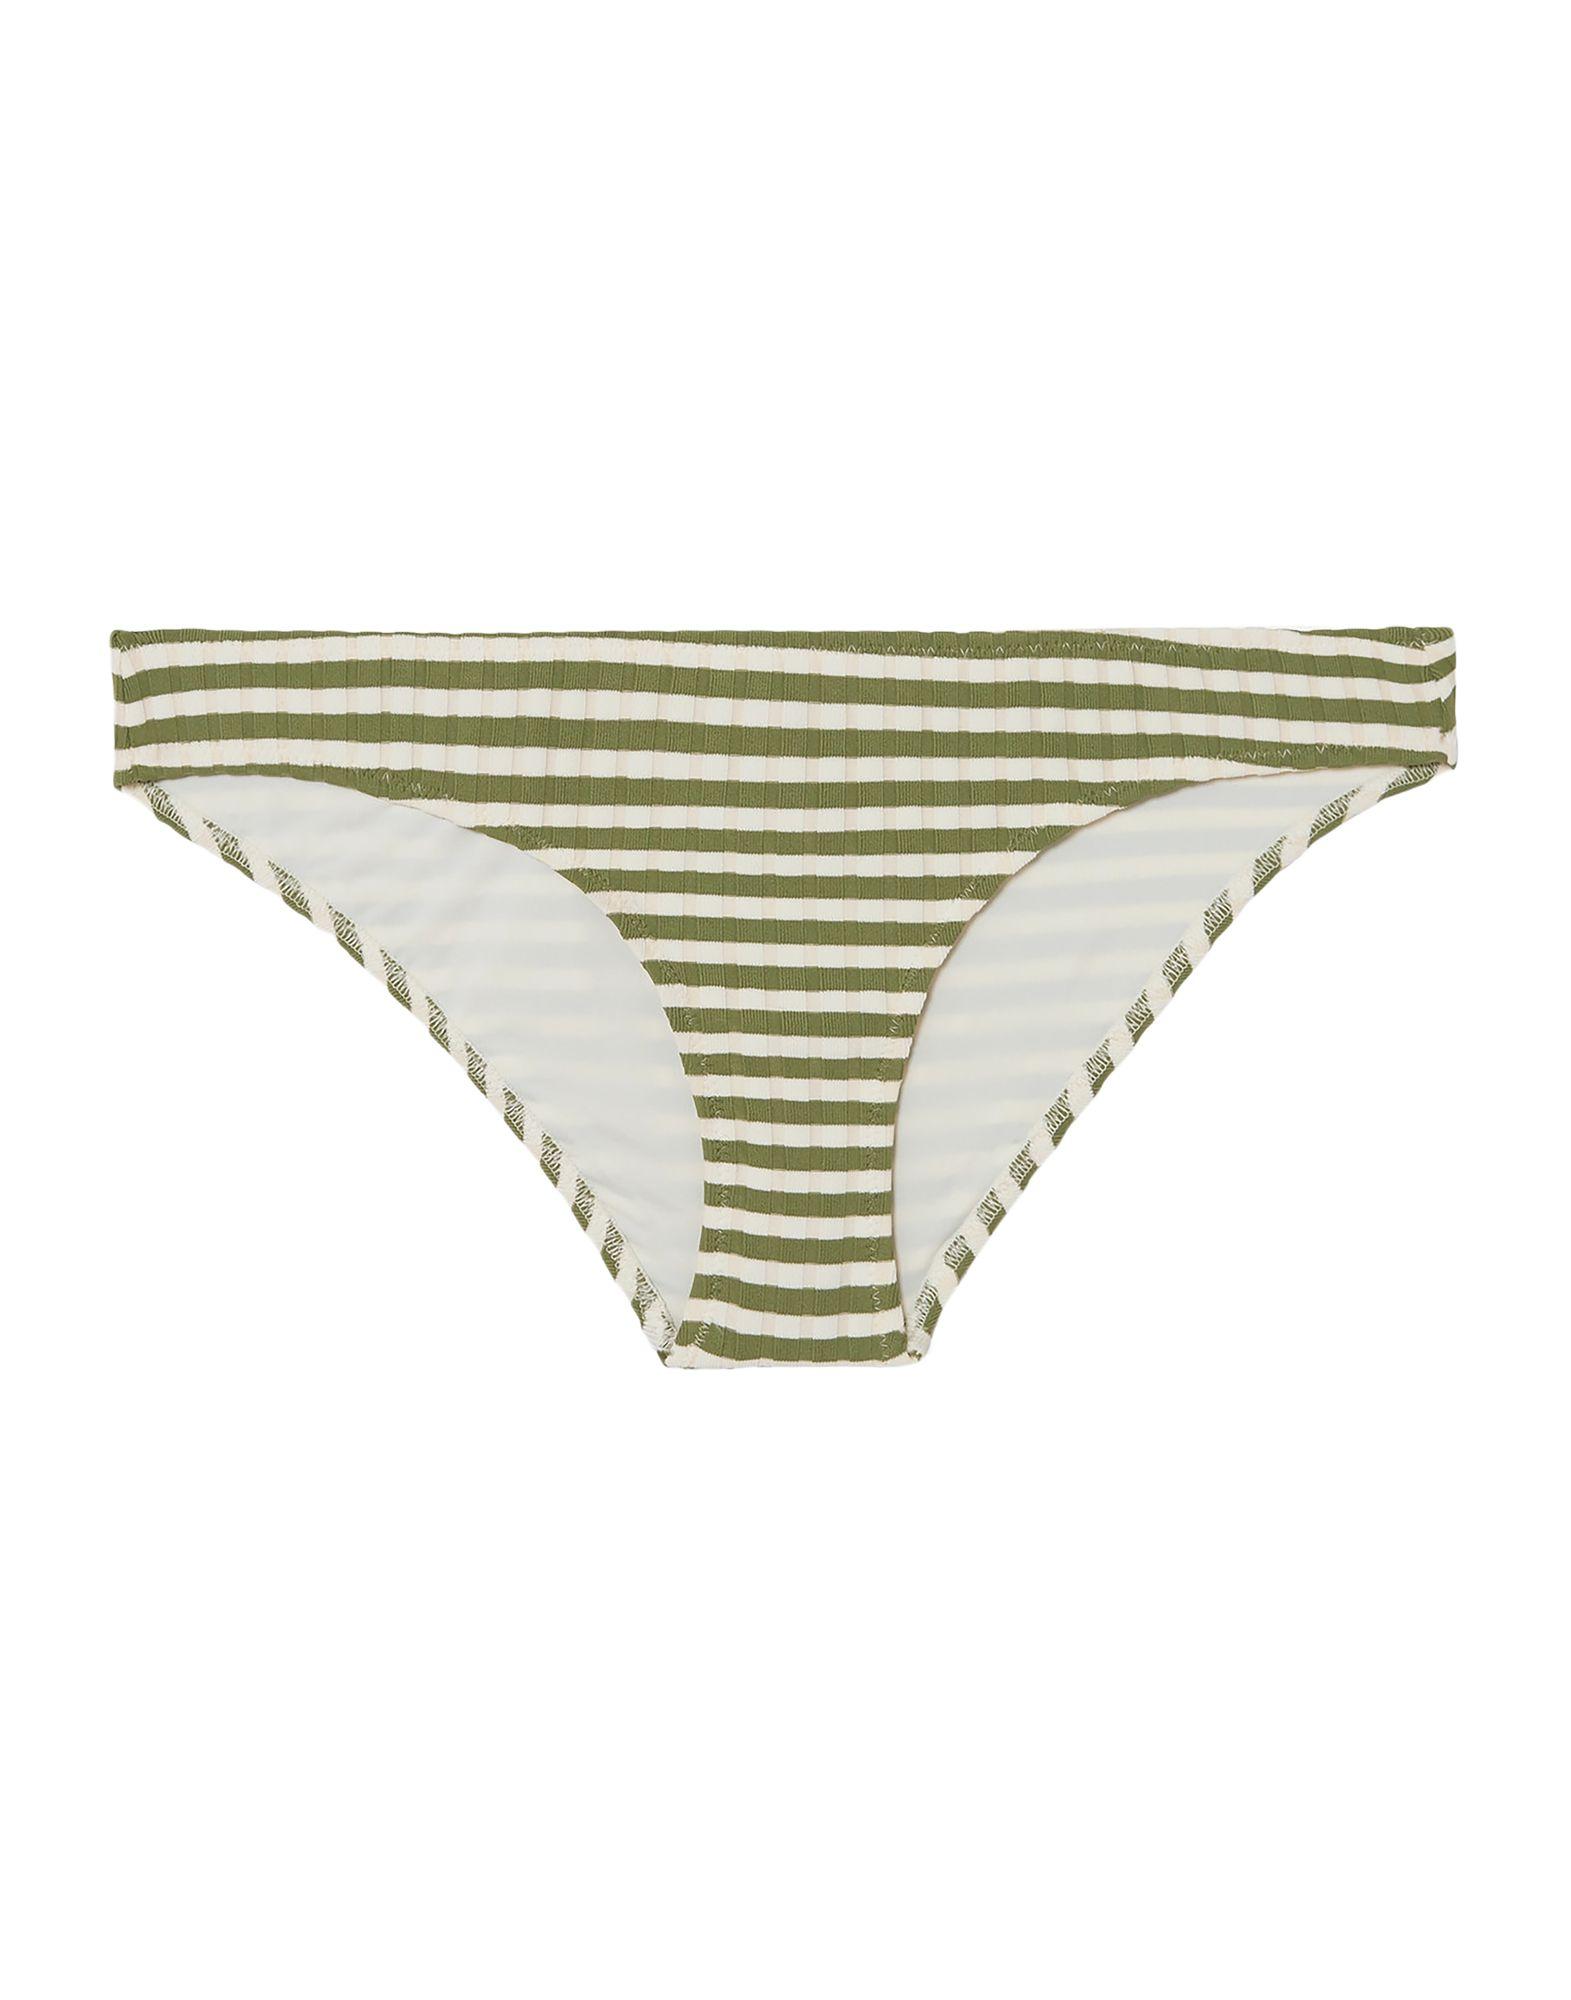 Фото - SOLID & STRIPED Купальные трусы beaded tassel embellished striped blouse